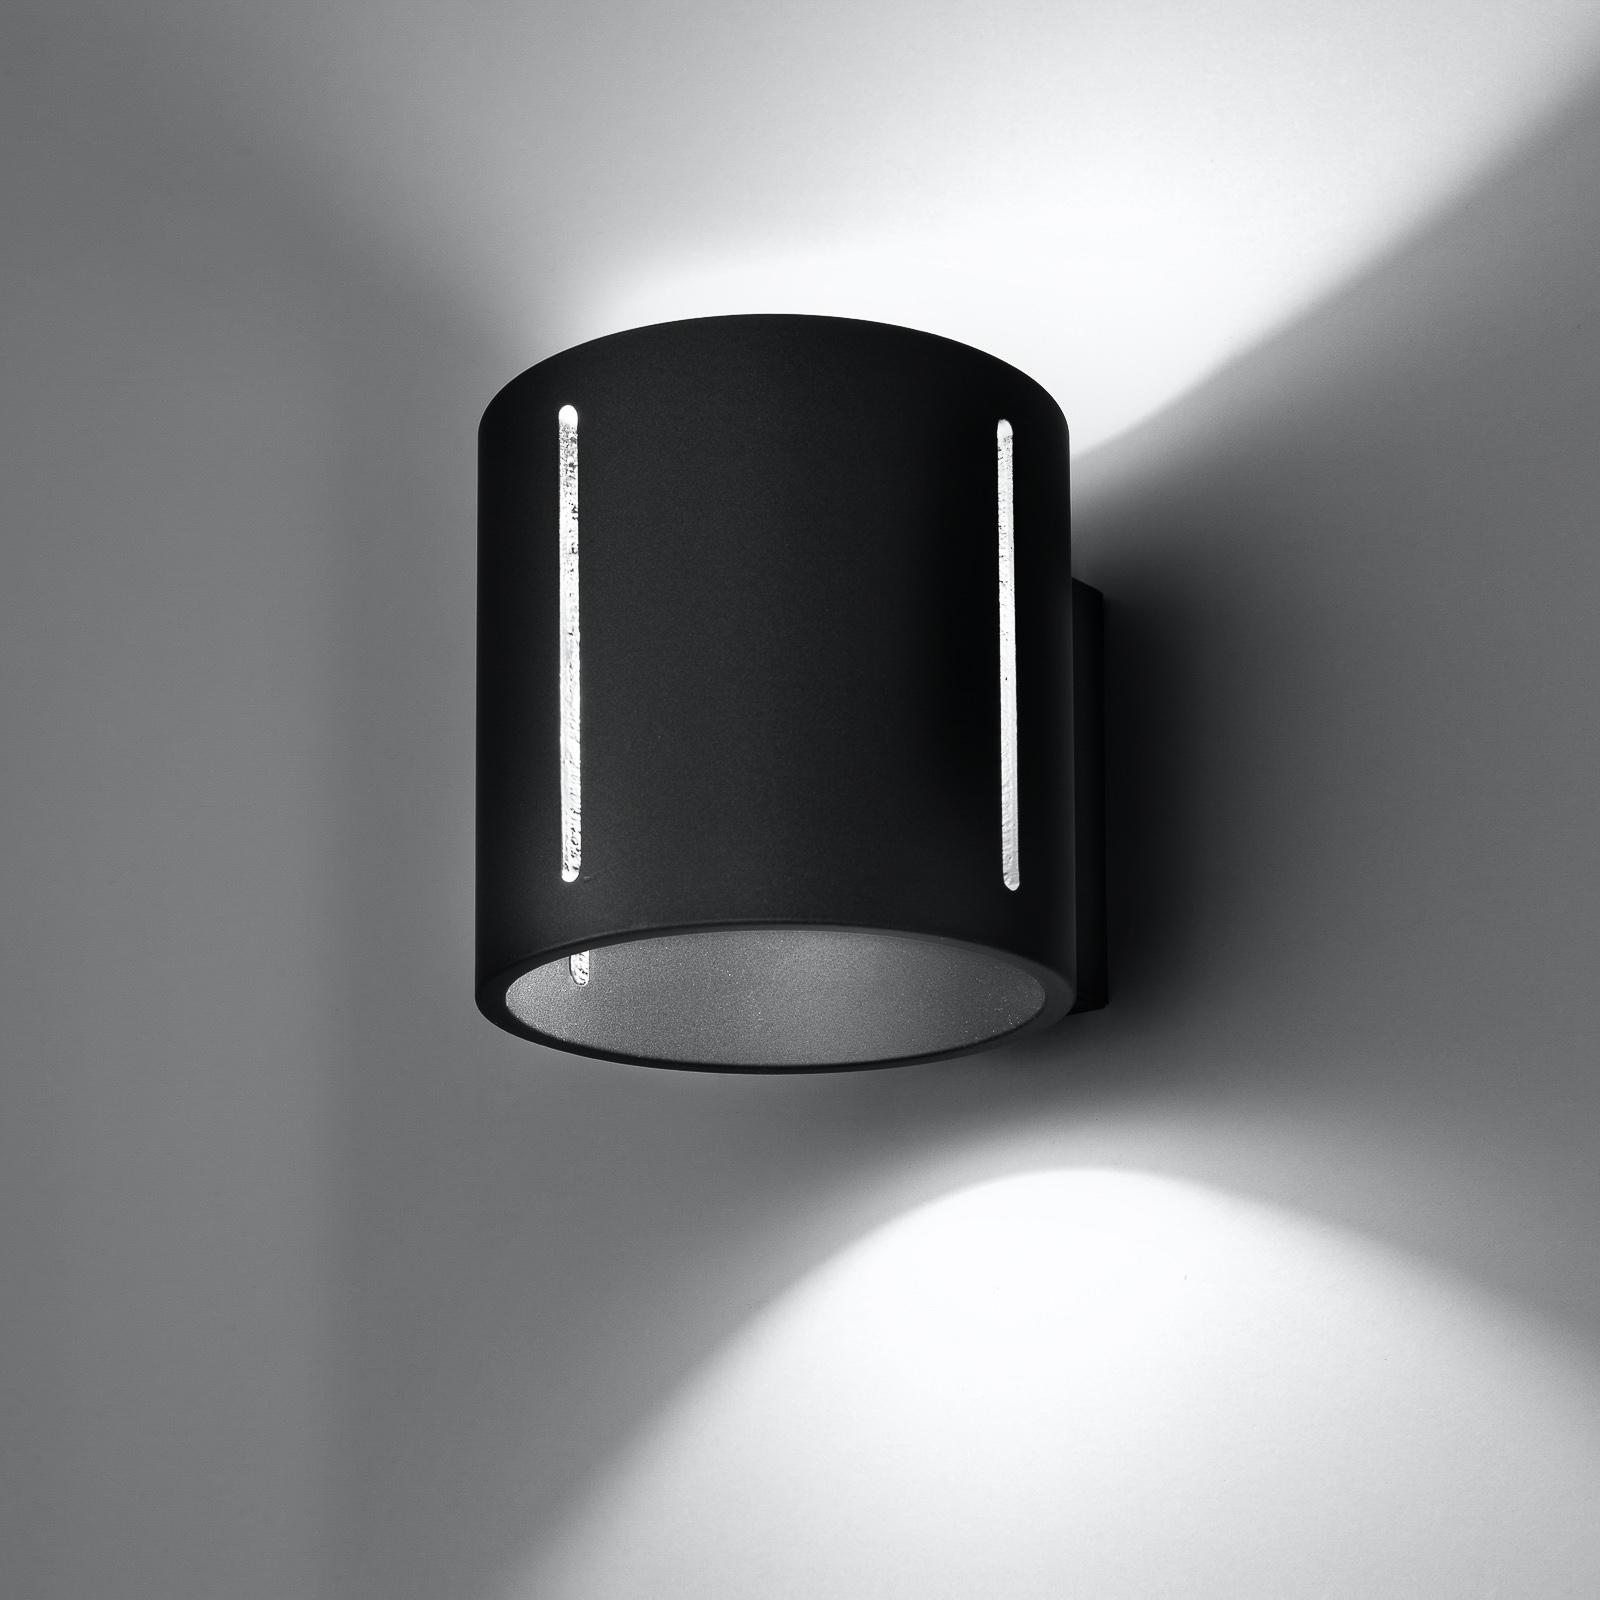 Lampa ścienna Topa up/down, czarny korpus